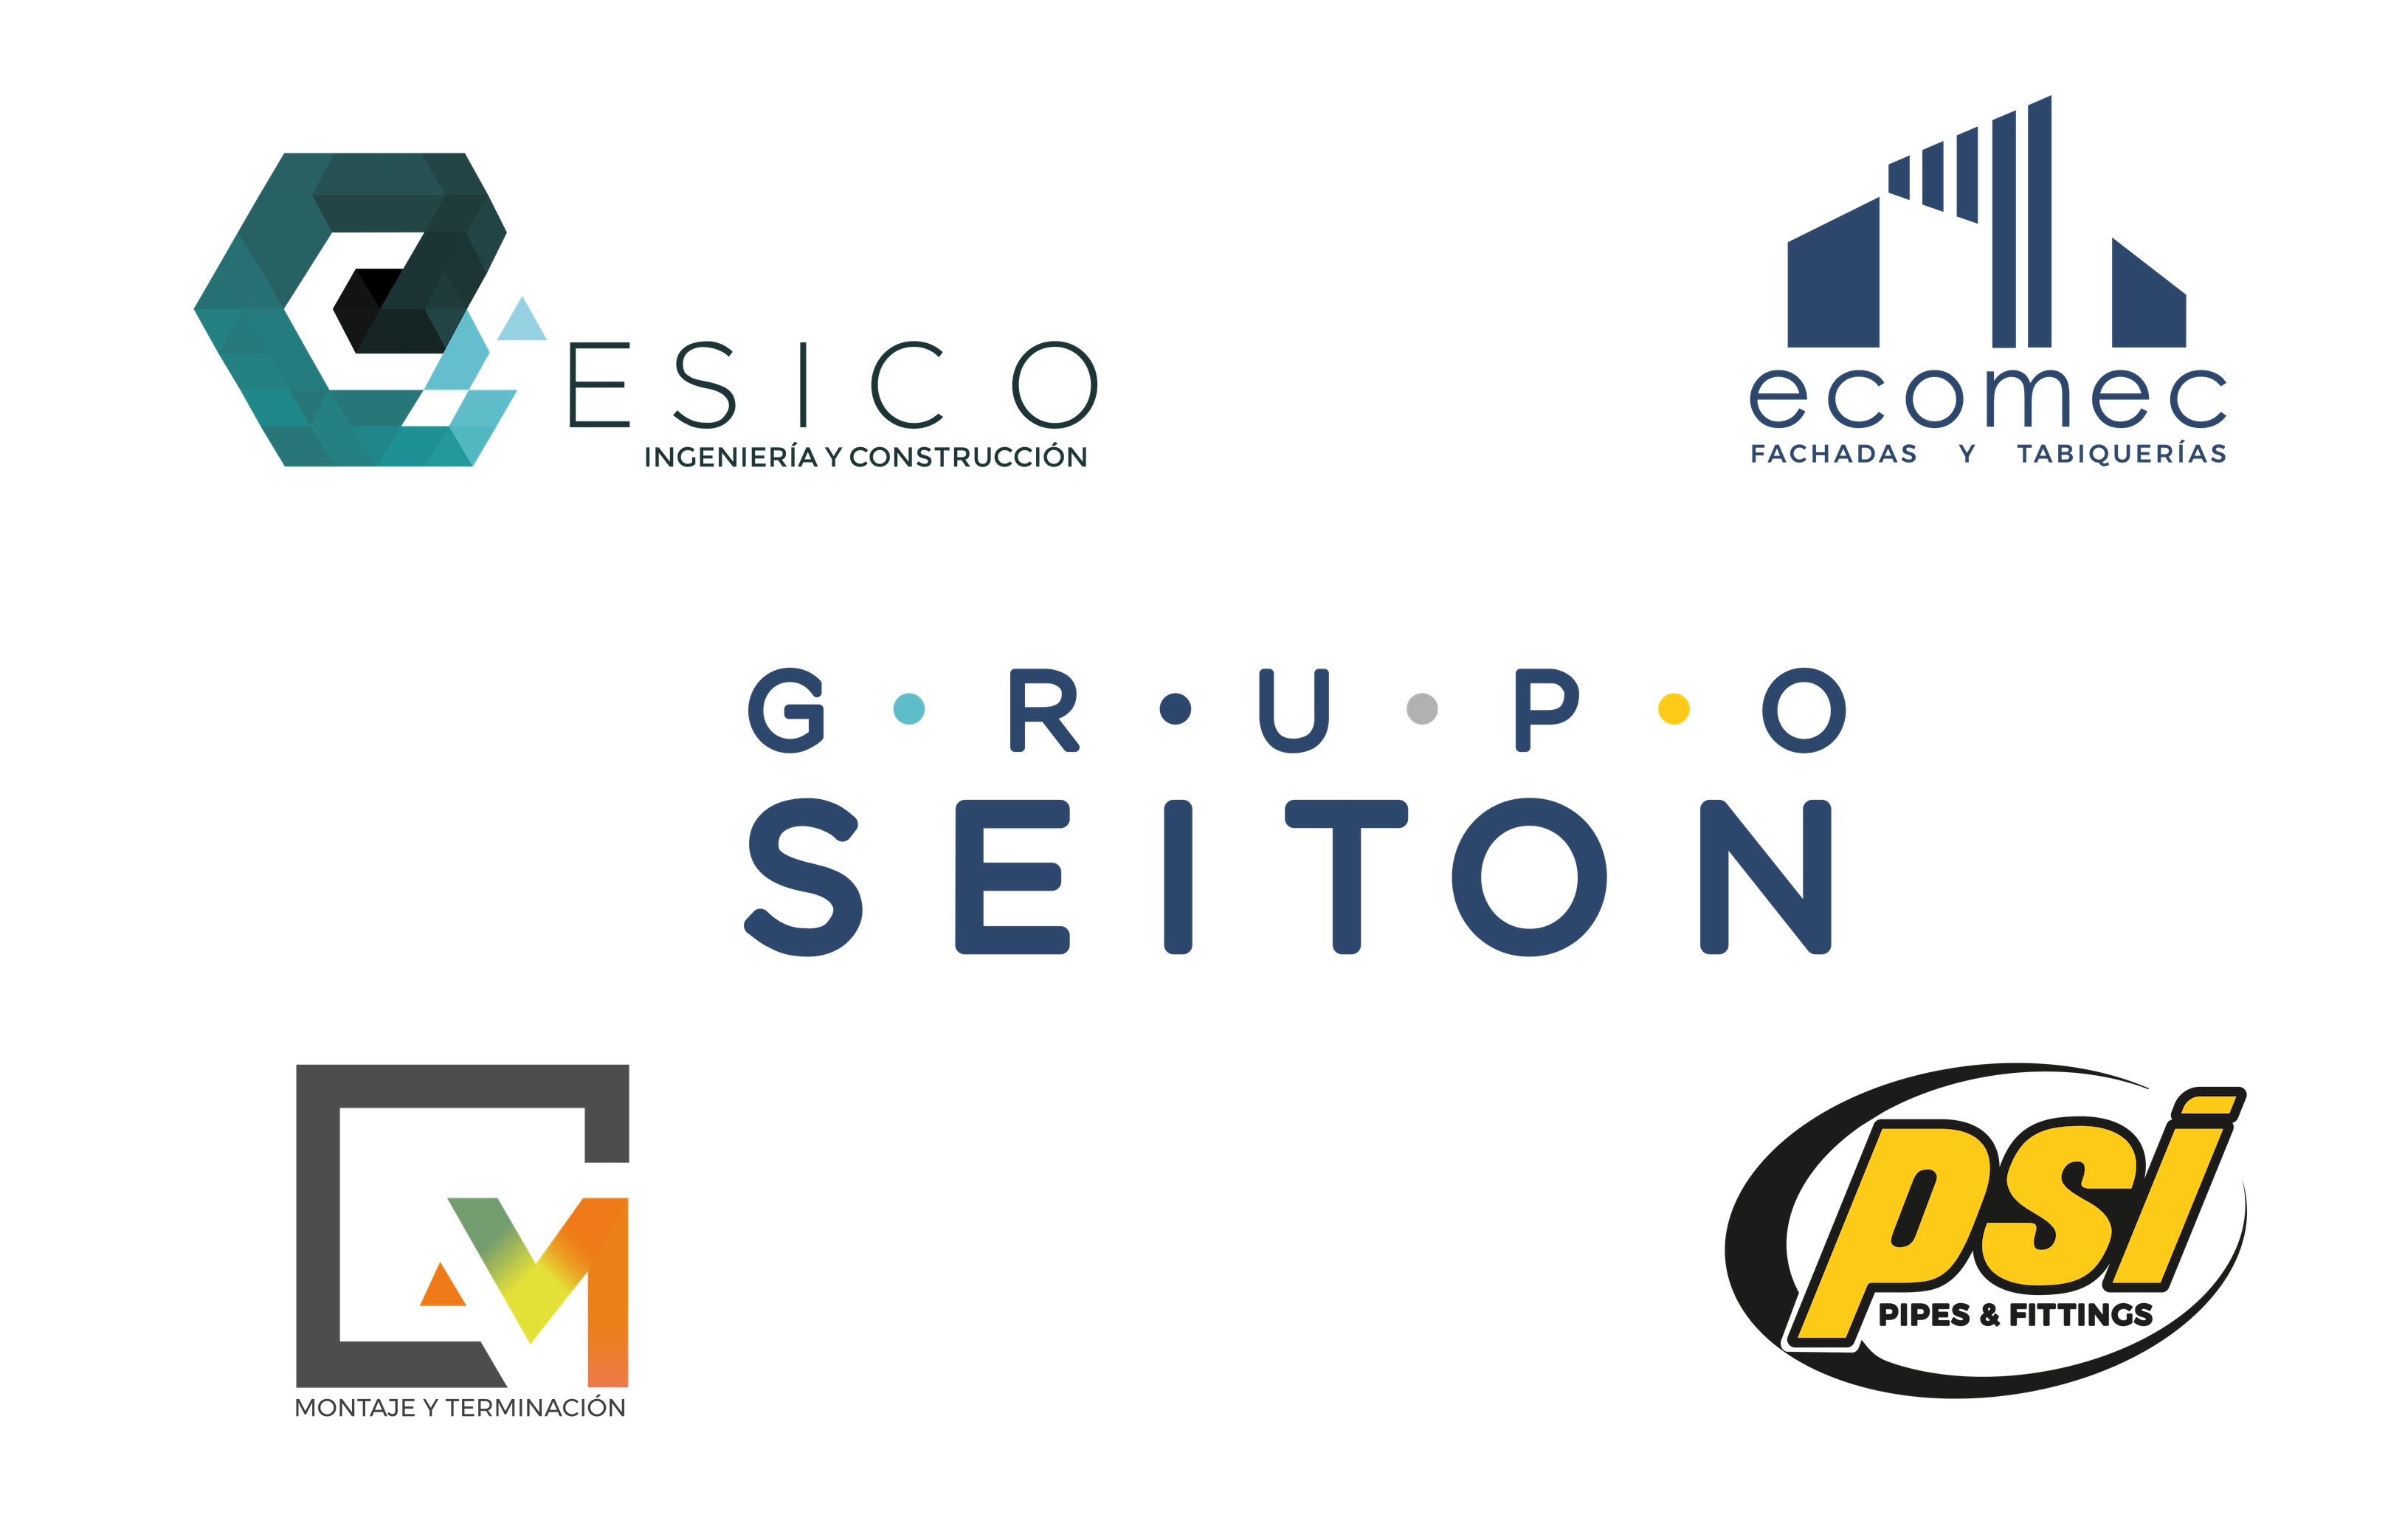 http://www.esico.cl/wp-content/uploads/2020/11/GRUPO_DE_MARCAS_SEITON_PNG_SIN_FONDO_logotipo-V2.png